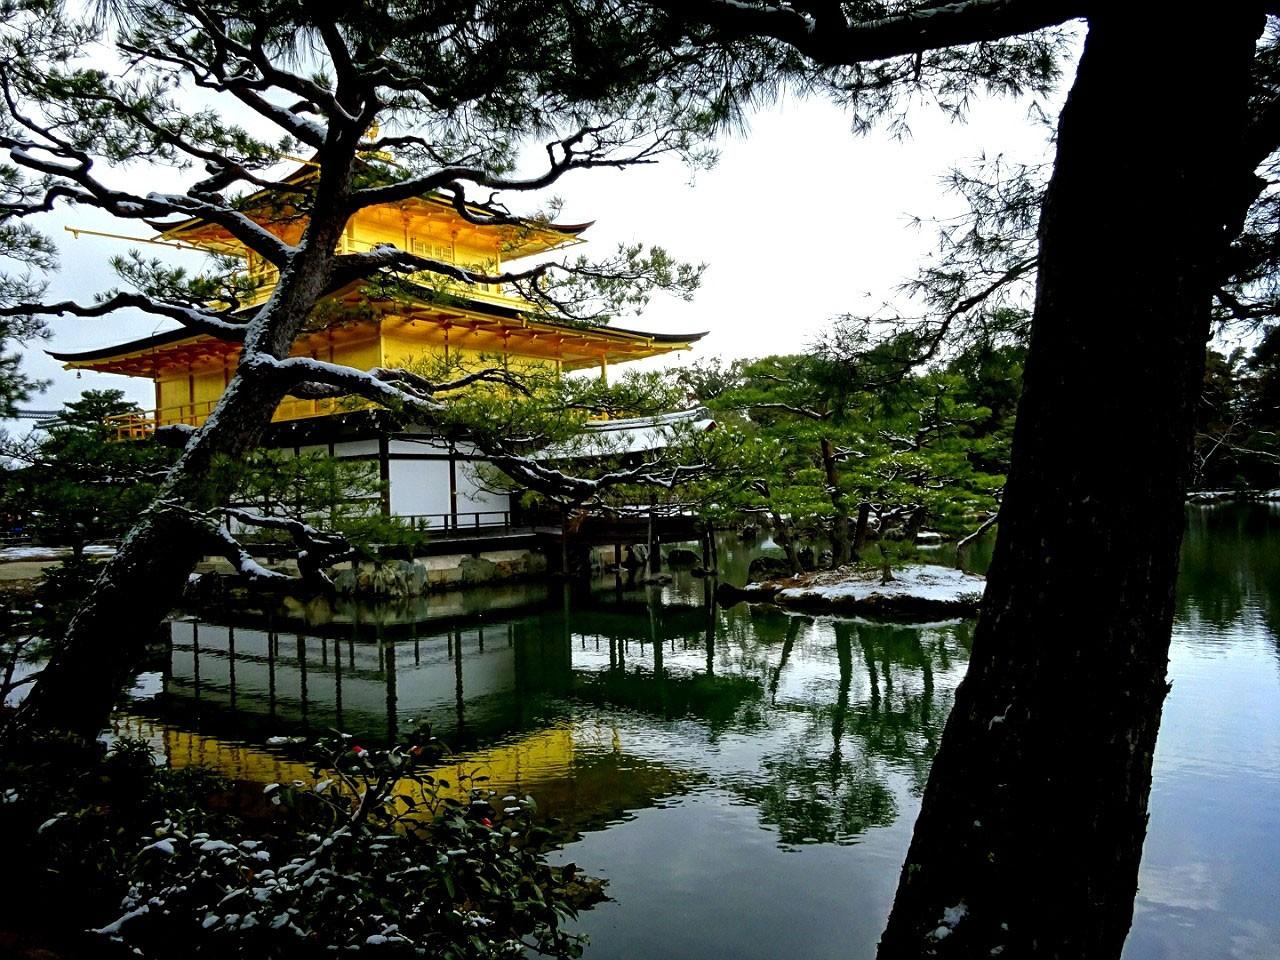 雪の金閣寺. Foto de yukachin58